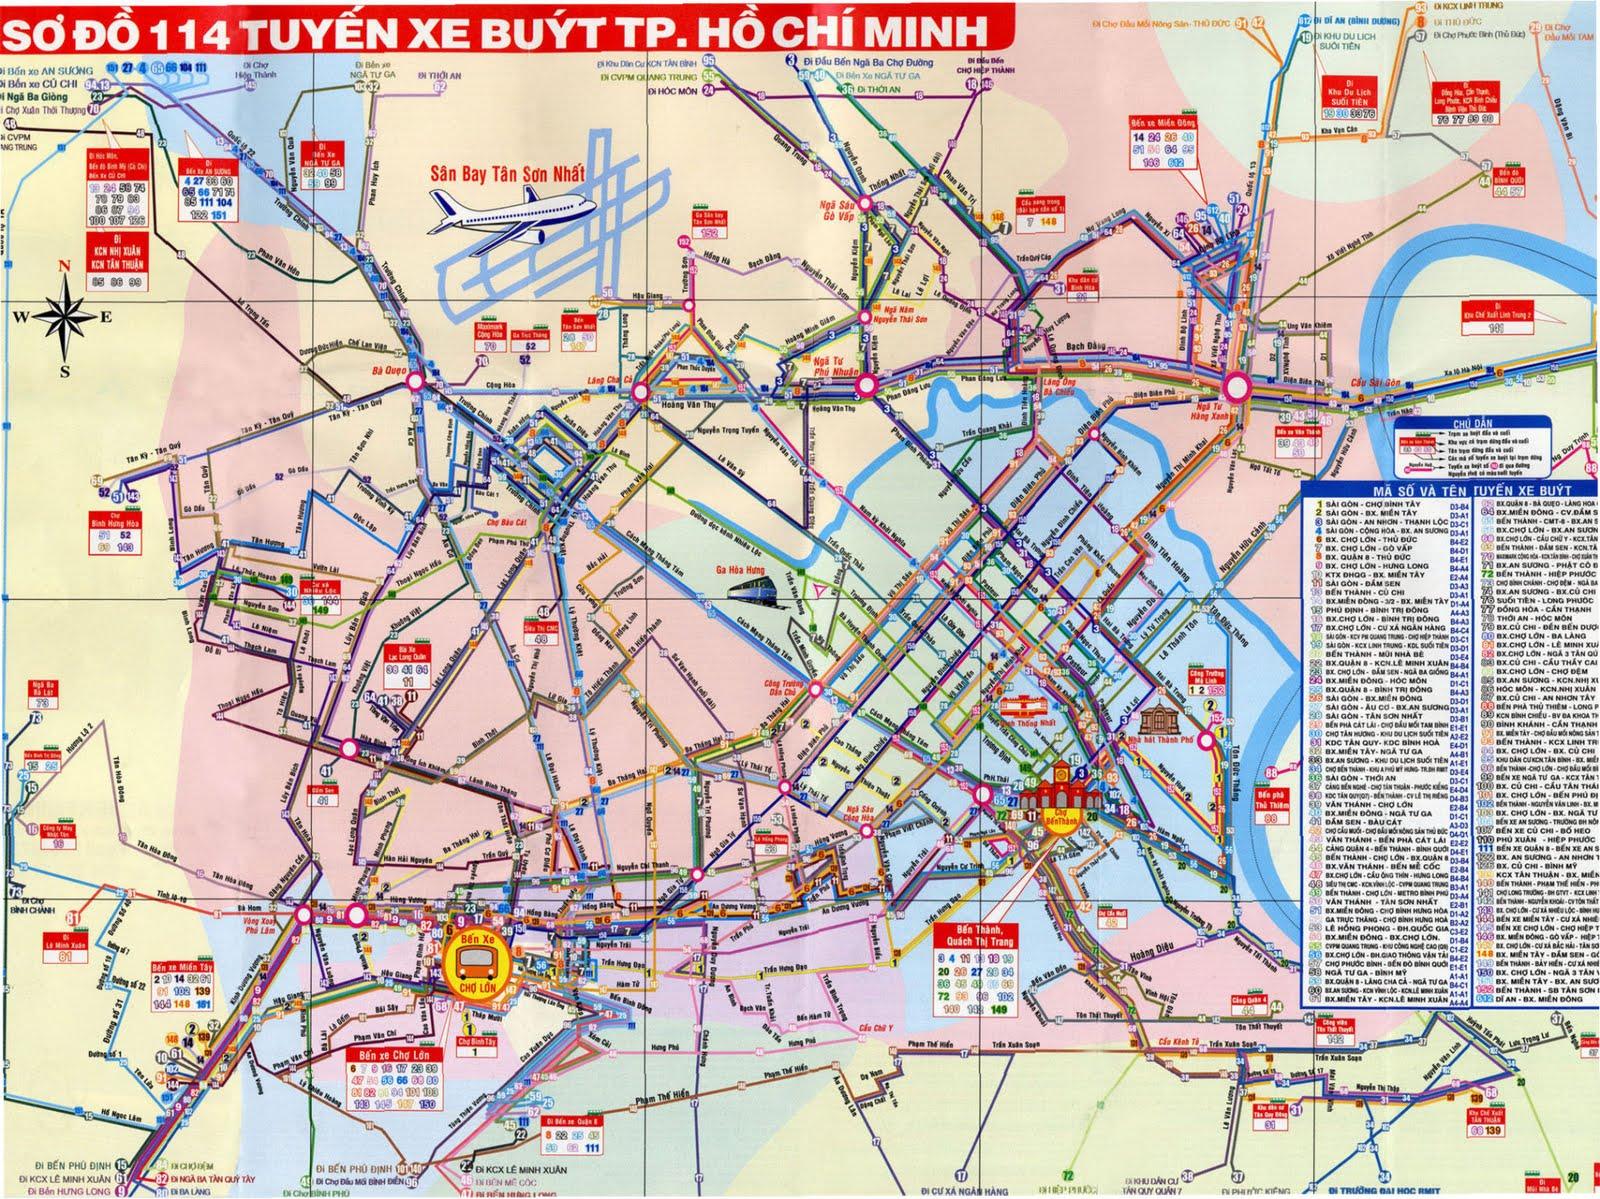 Ho Chi Minh Vietnam Map.Saigon Map Tourist Map City Map And Street Map Of Ho Chi Minh